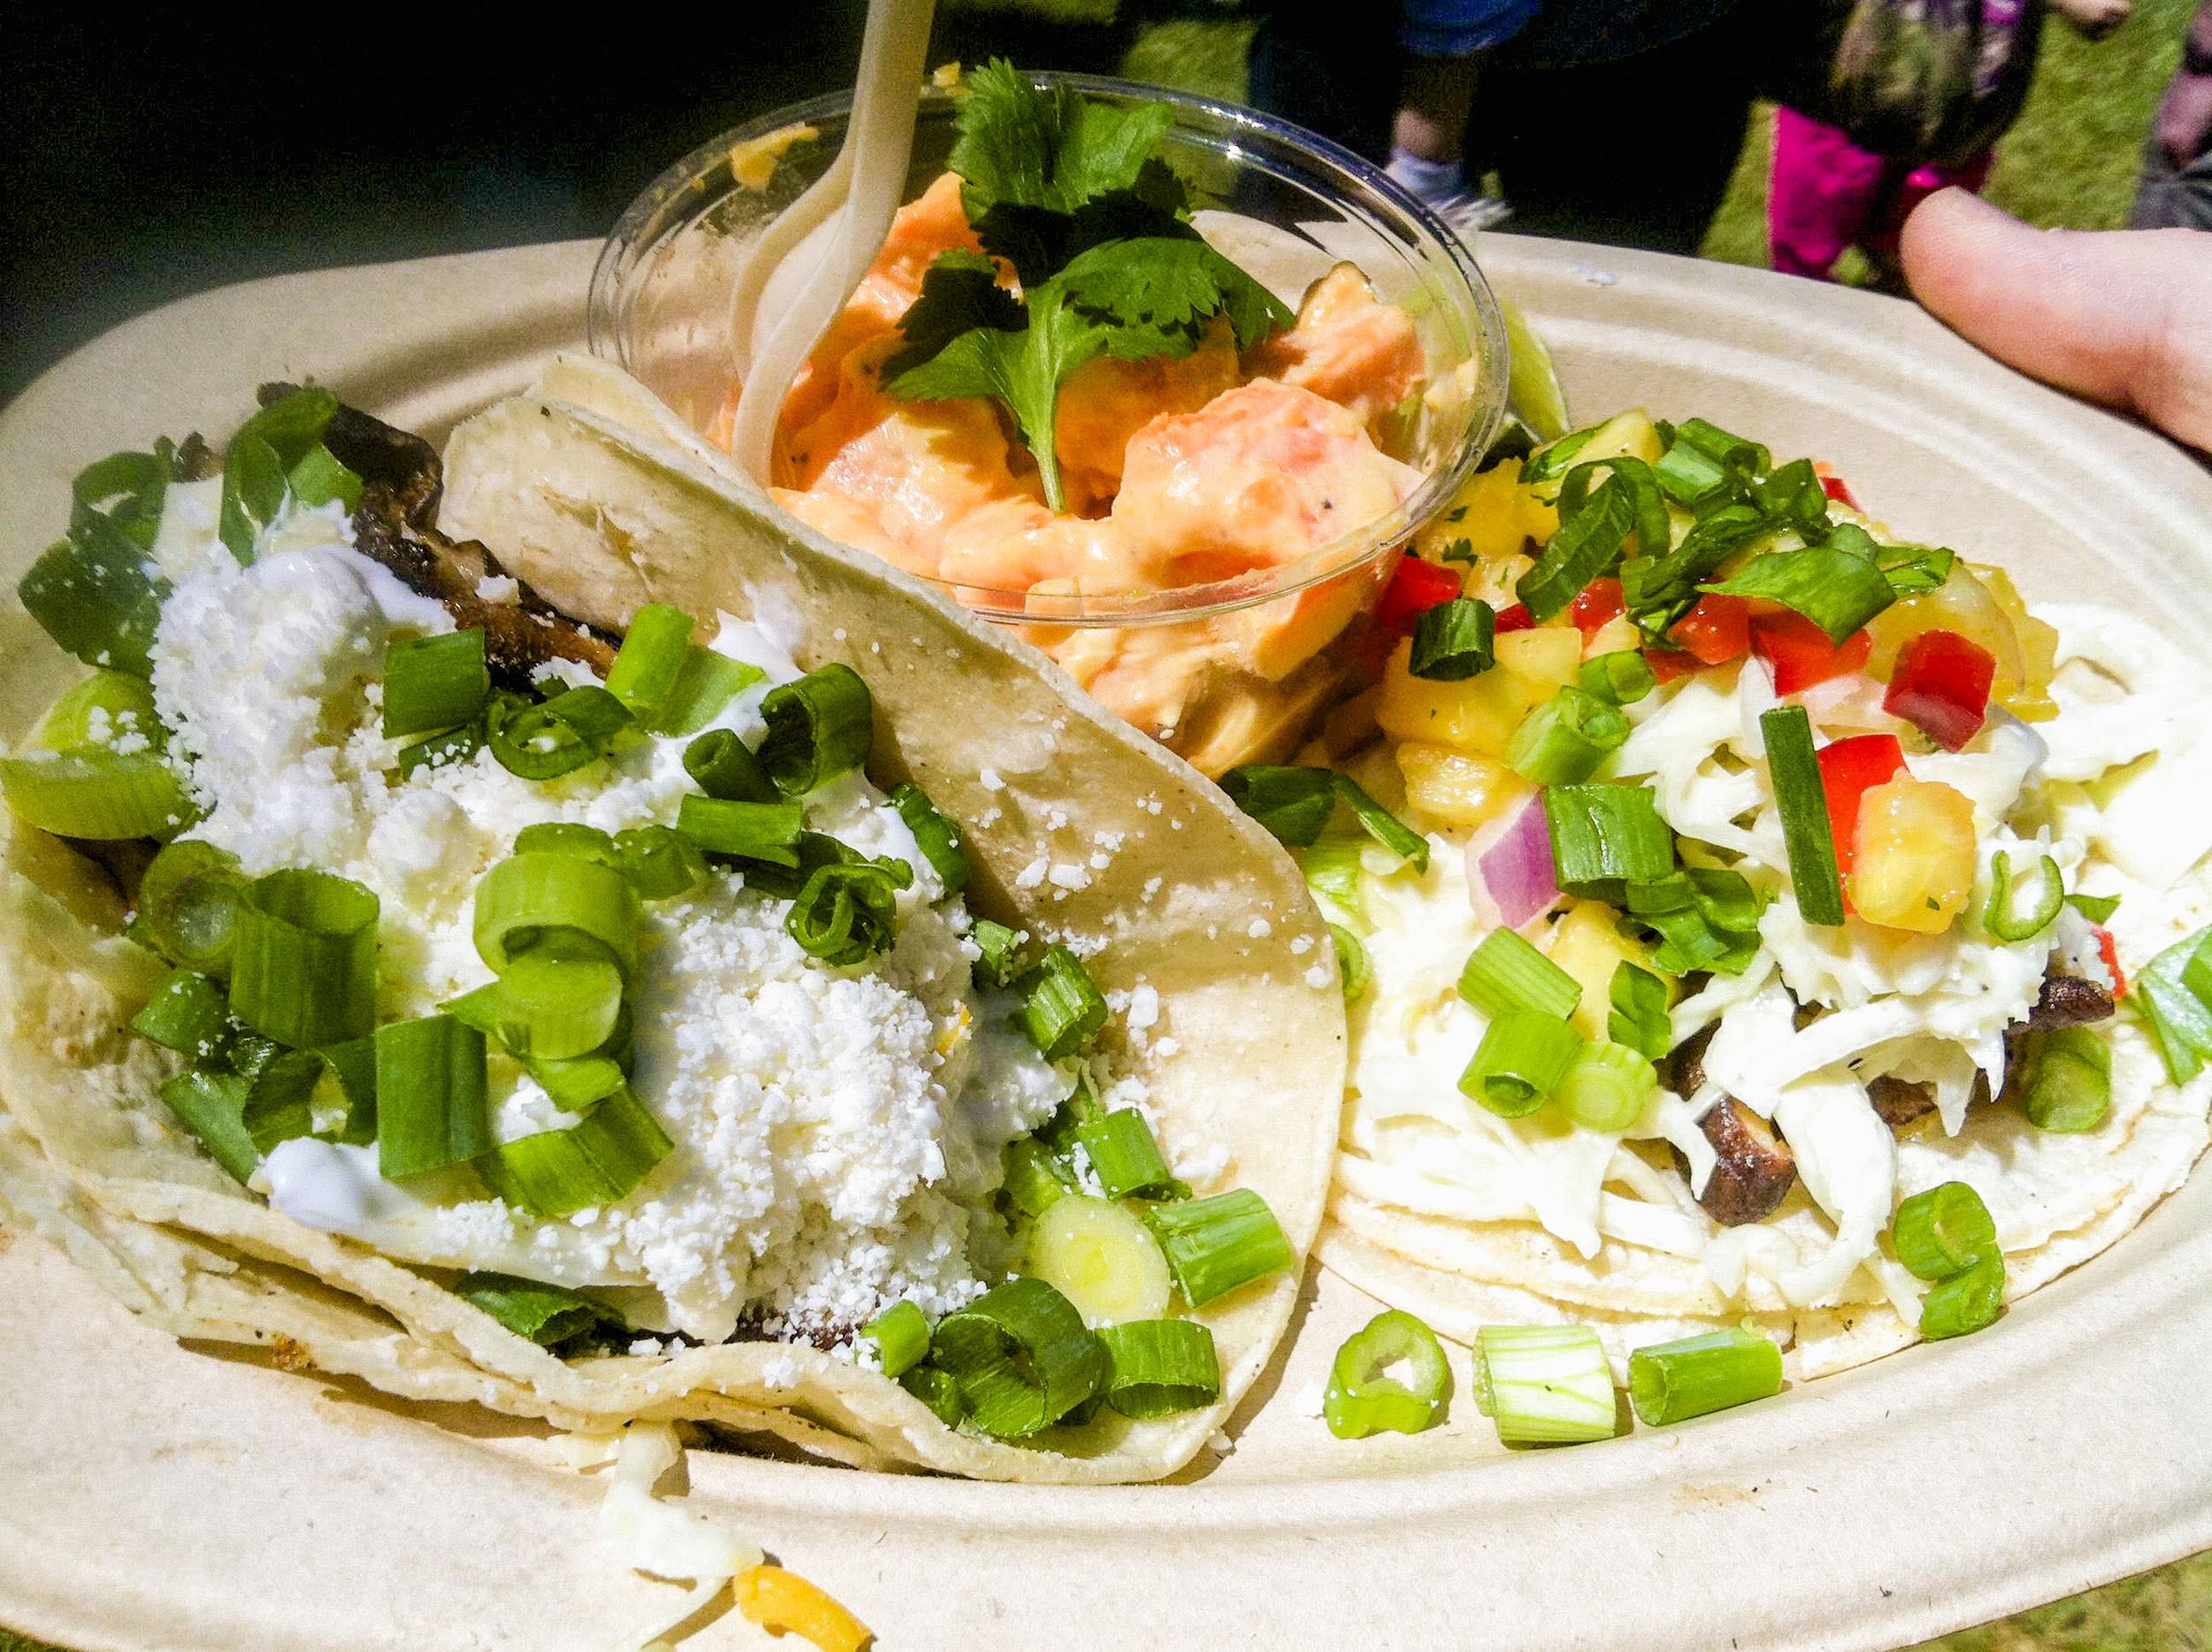 The original taco plate at Shiitake Swerve.